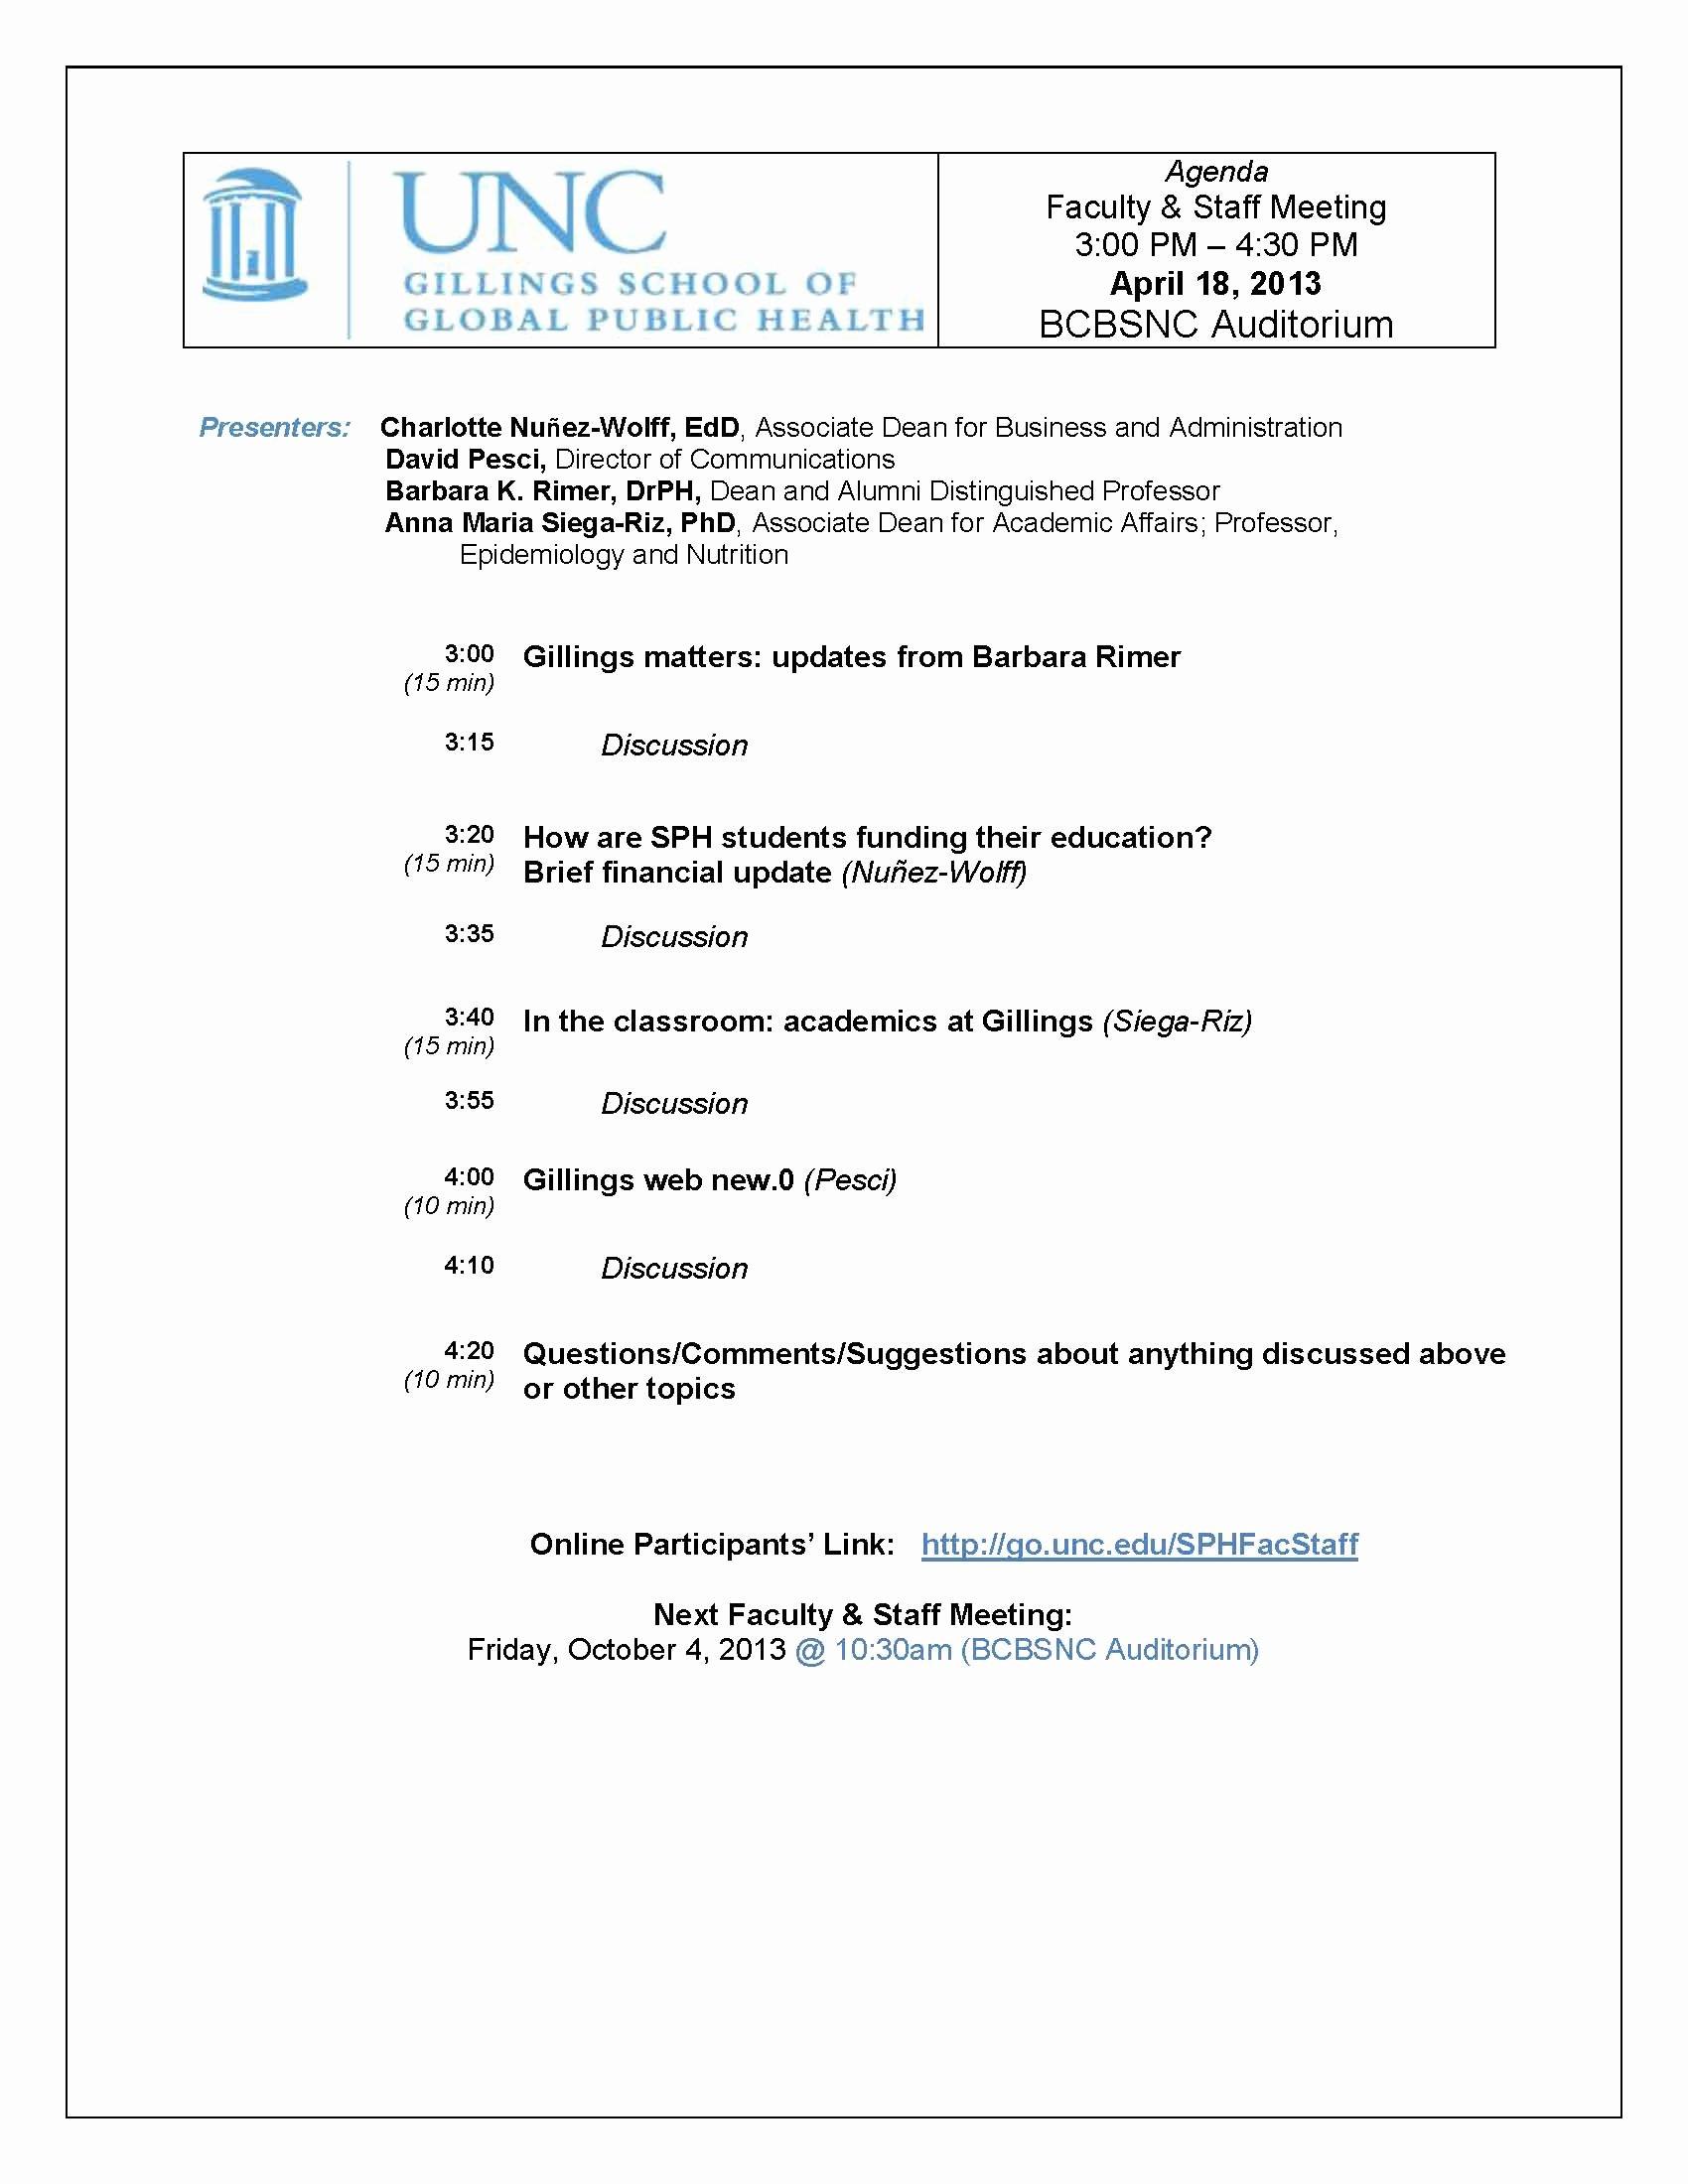 Church Staff Meeting Agenda Elegant Faculty Staff Meetings Archives • Unc Gillings School Of